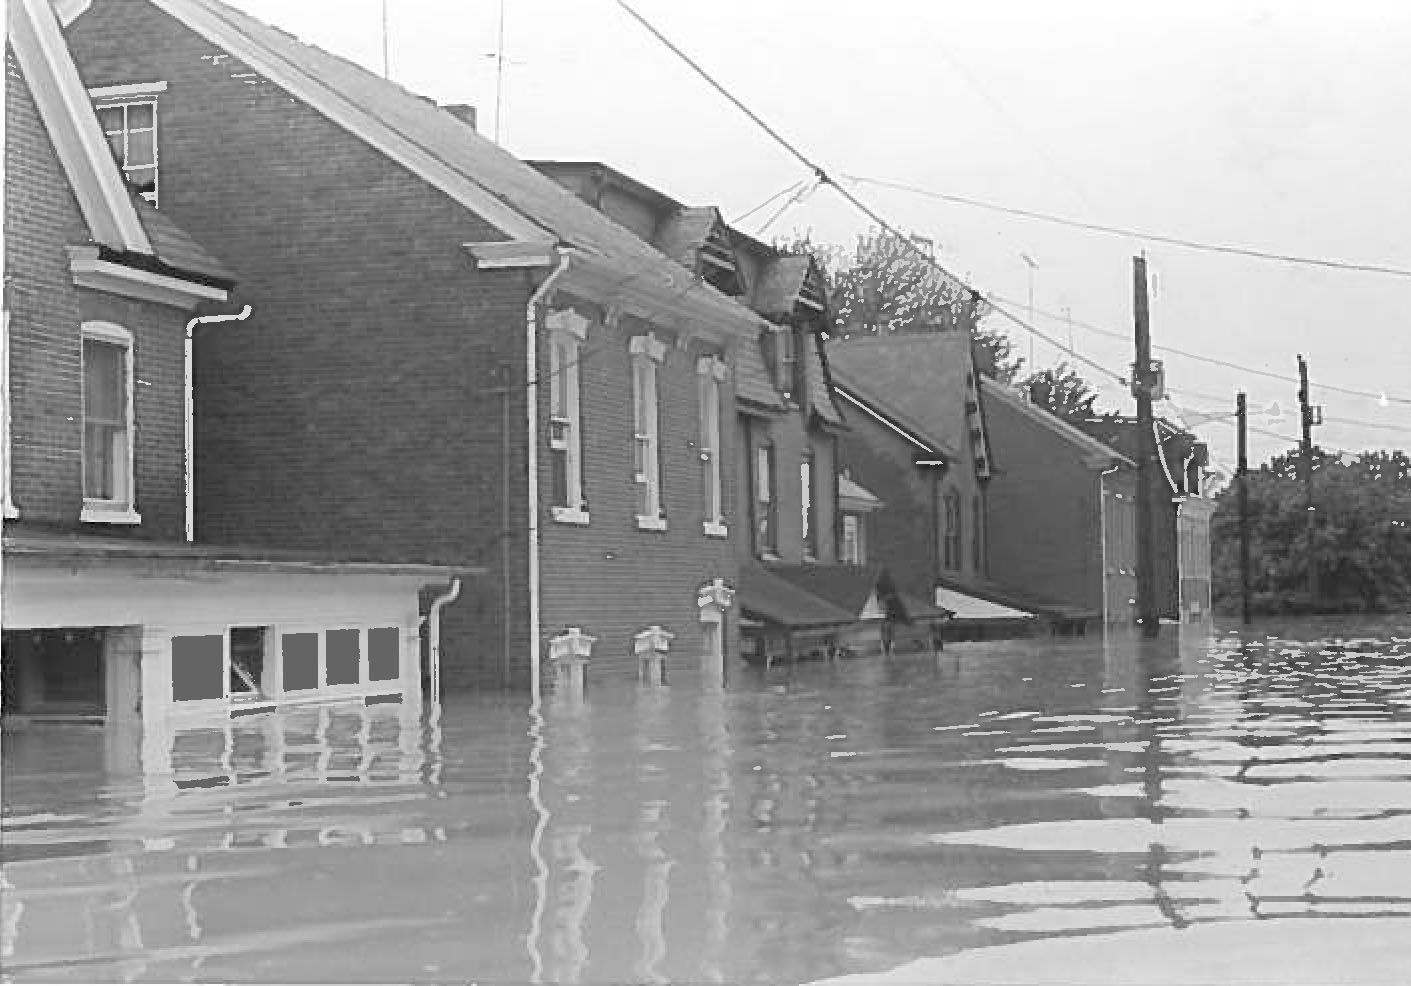 Walnut Street In Pottstown Pa Flooded During Hurricane